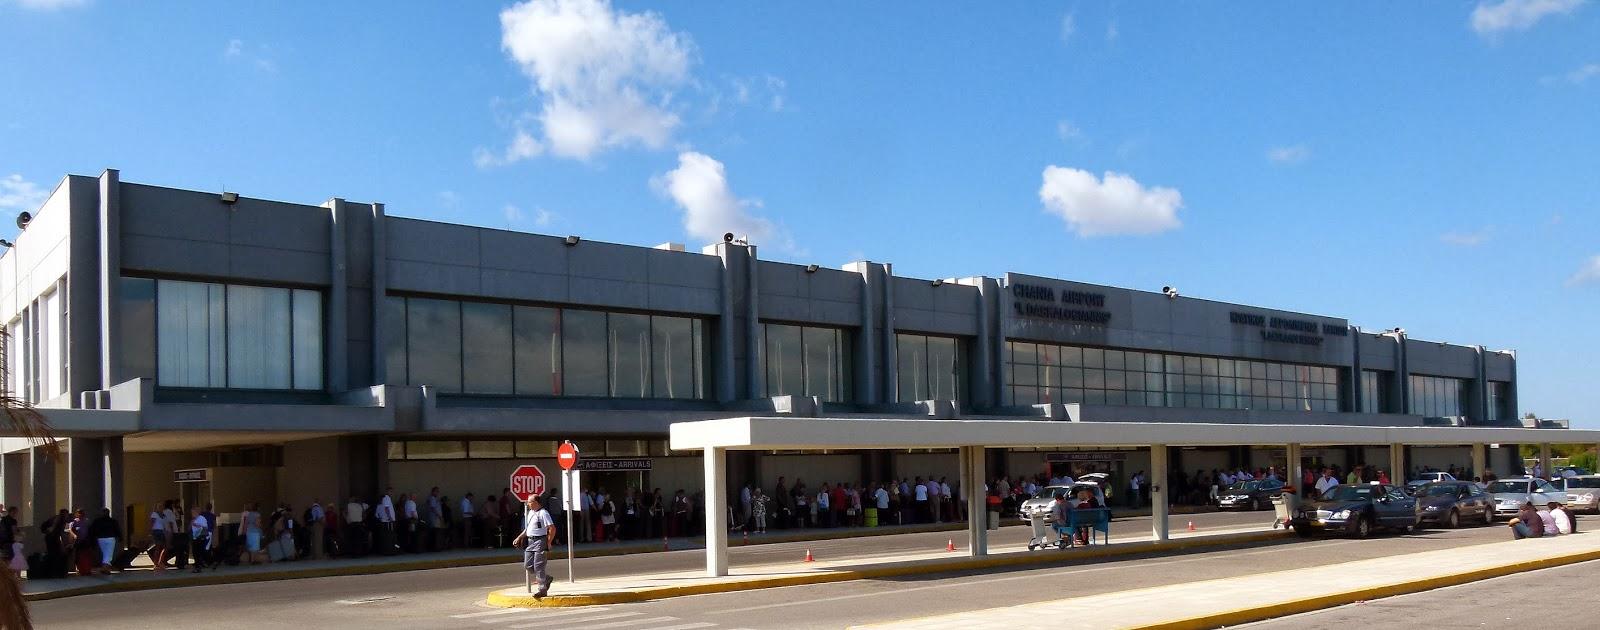 Aéroport international de Chania K. Daskalogiannis